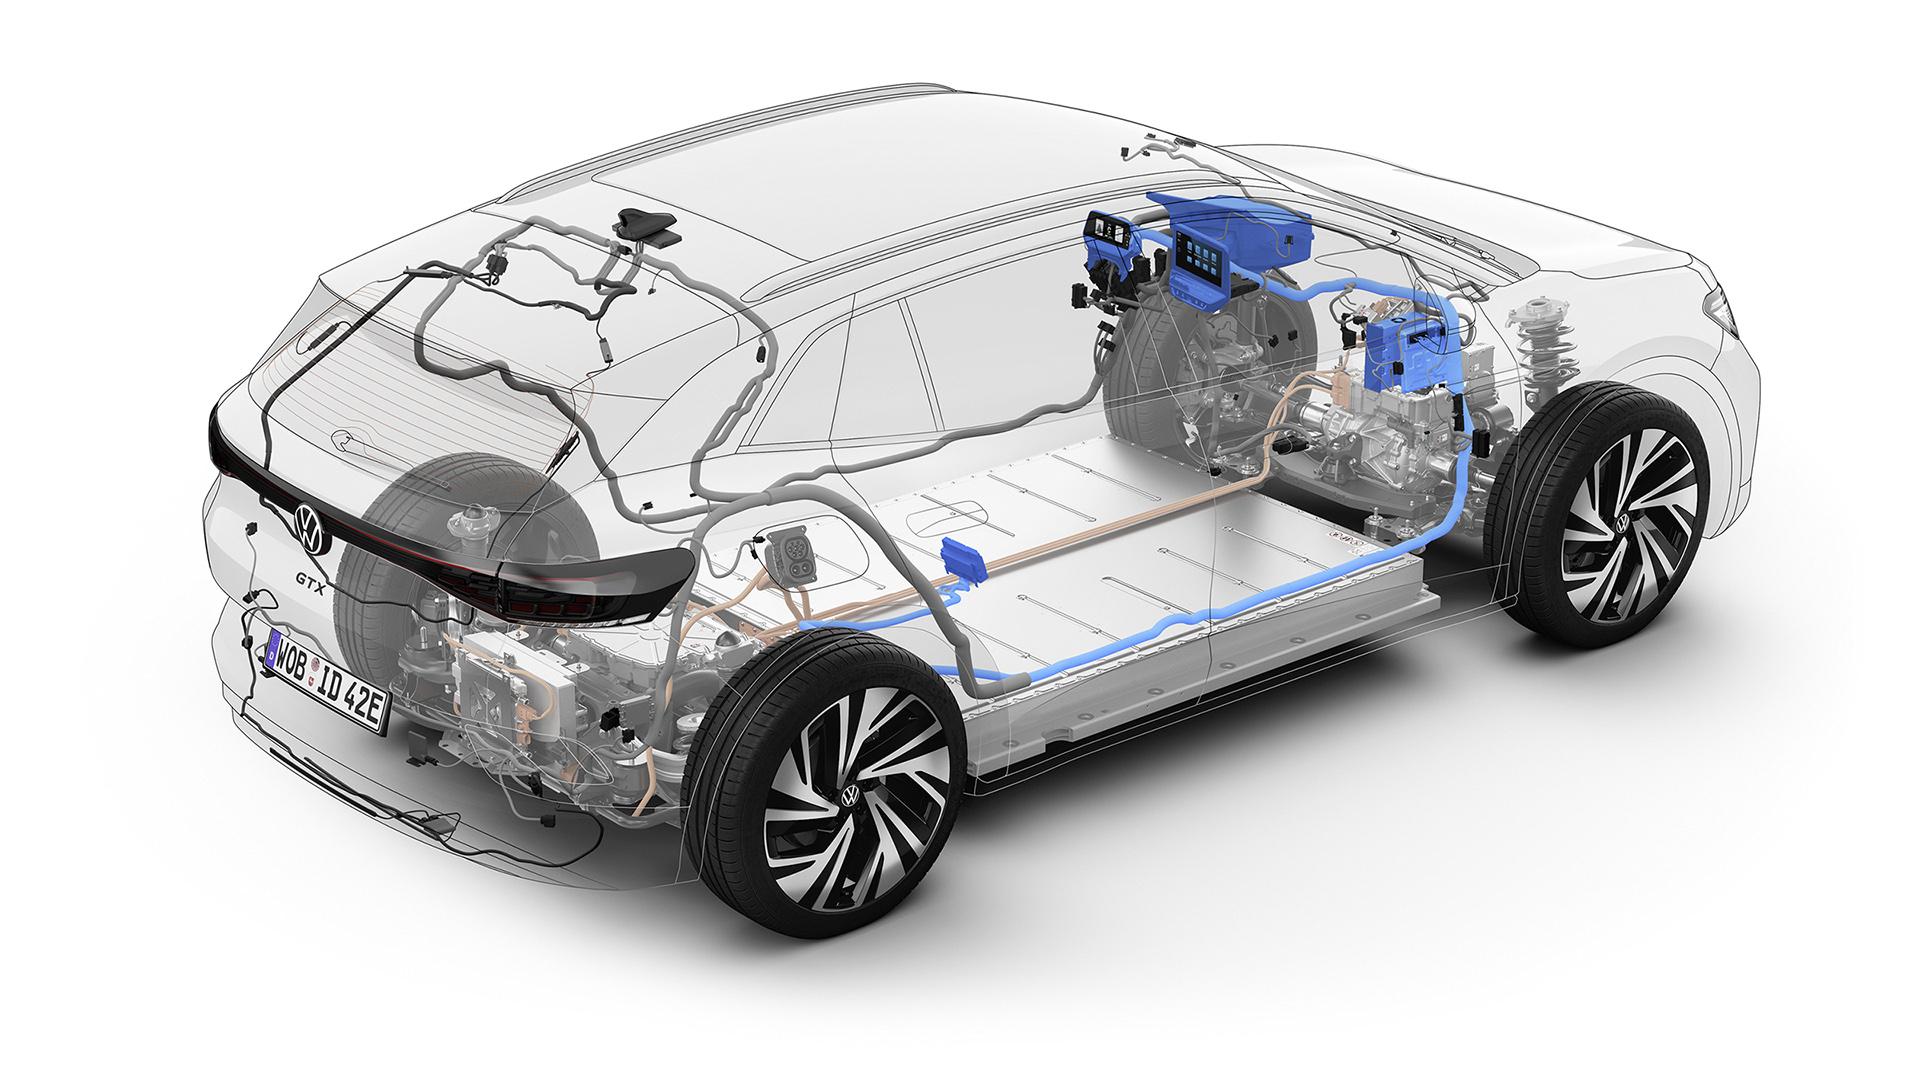 "ID.4 GTX Η Volkswagen μας αφήνει να ρίξουμε μια ""ματιά"" στο μέλλον της αυτοκίνησης Electric cars, electric vehicles, ID.3, ID.4, ID.4 GTX, Volkswagen, Volkswagen Group, Volkswagen ID.3, Volkswagen ID.4, Volkswagen ID.4 GTX, VW, VW ID.3, zblog, ειδήσεις, ηλεκτρικά, ηλεκτροκινηση, κινουμαι ηλεκτρικα, Νέα"